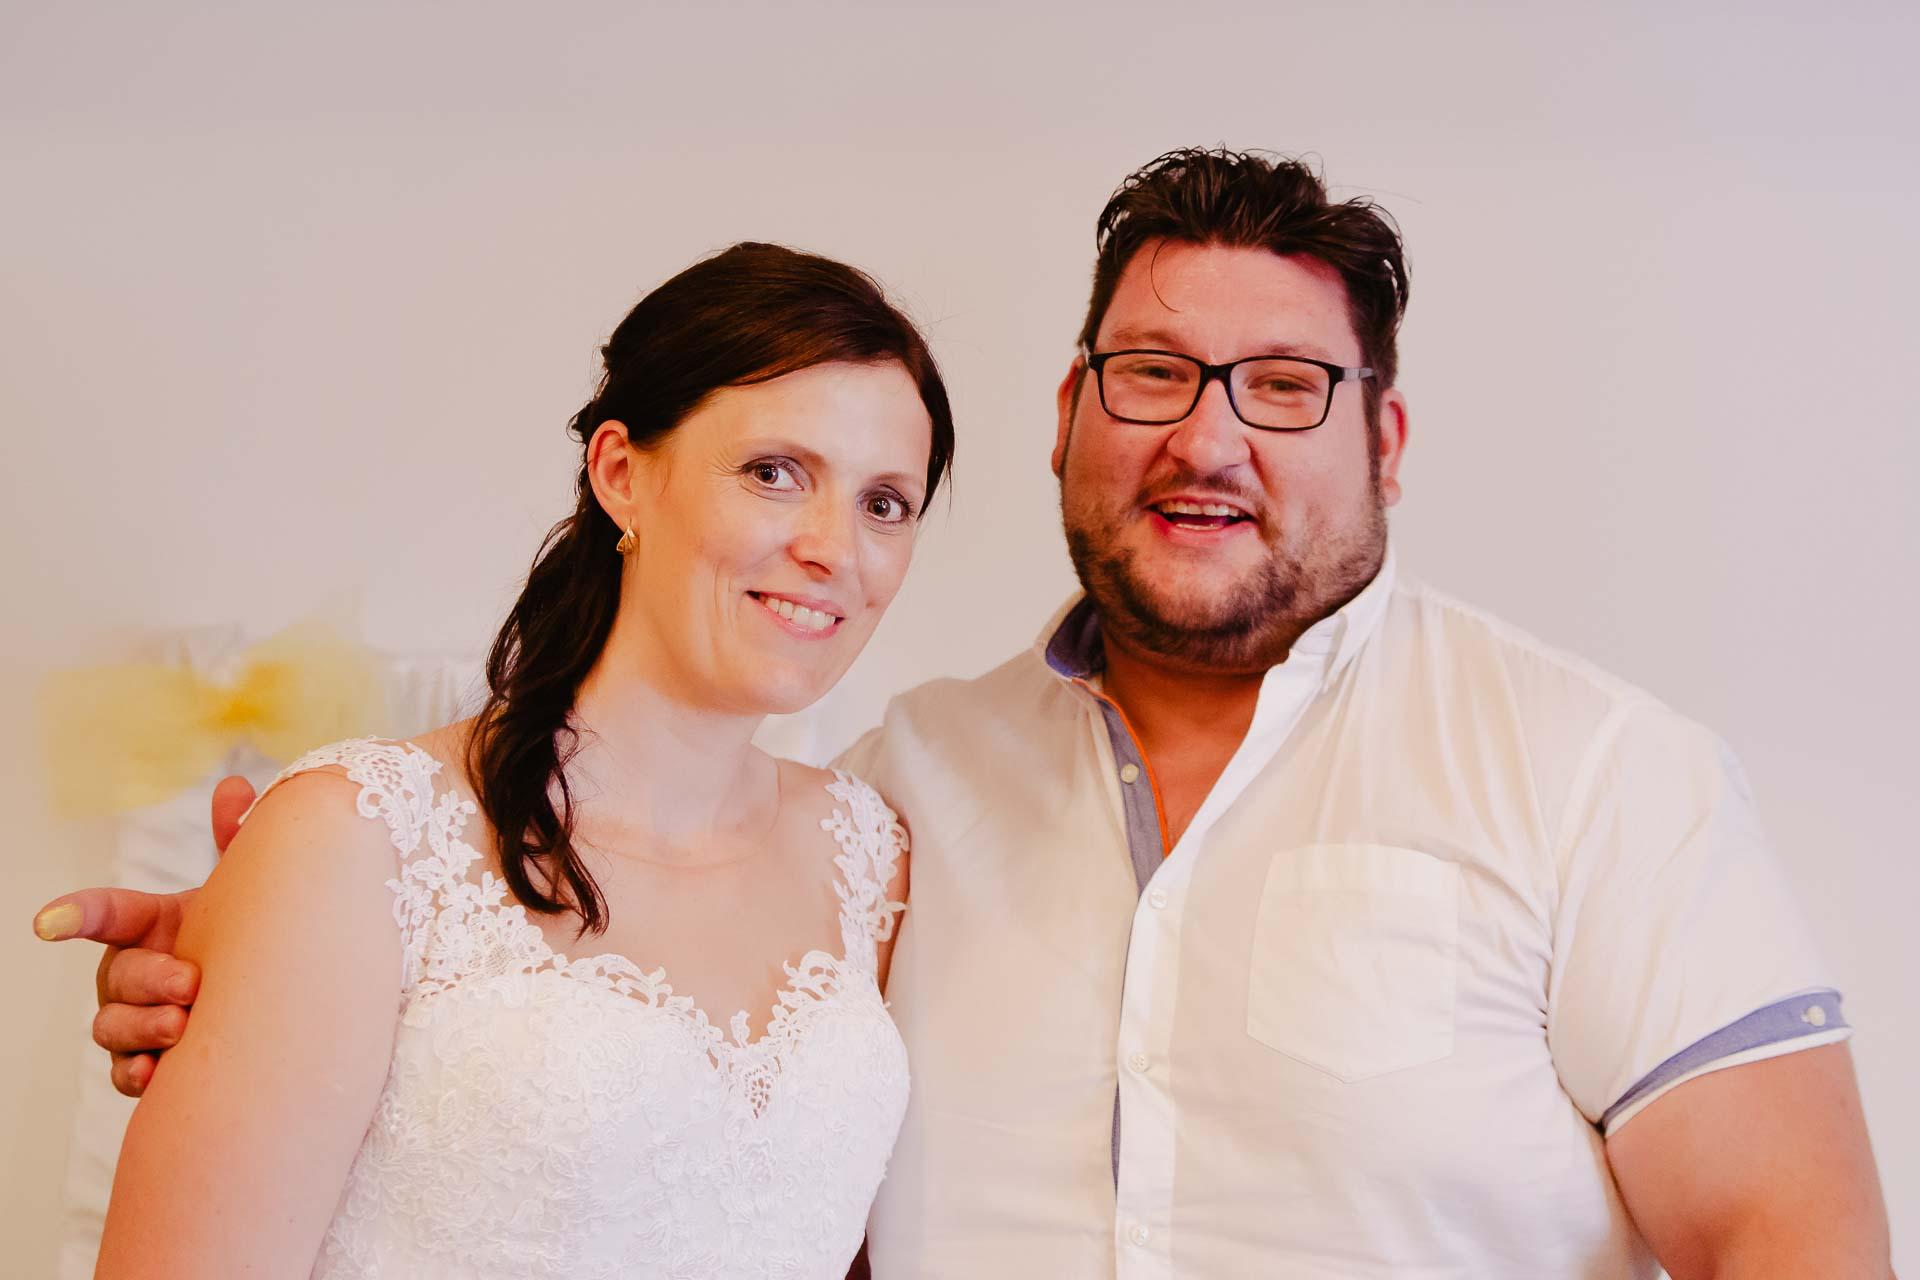 Svatební-fotograf-zámek-Karlova-Koruna-Chlumec-nad-Cidlinou-249